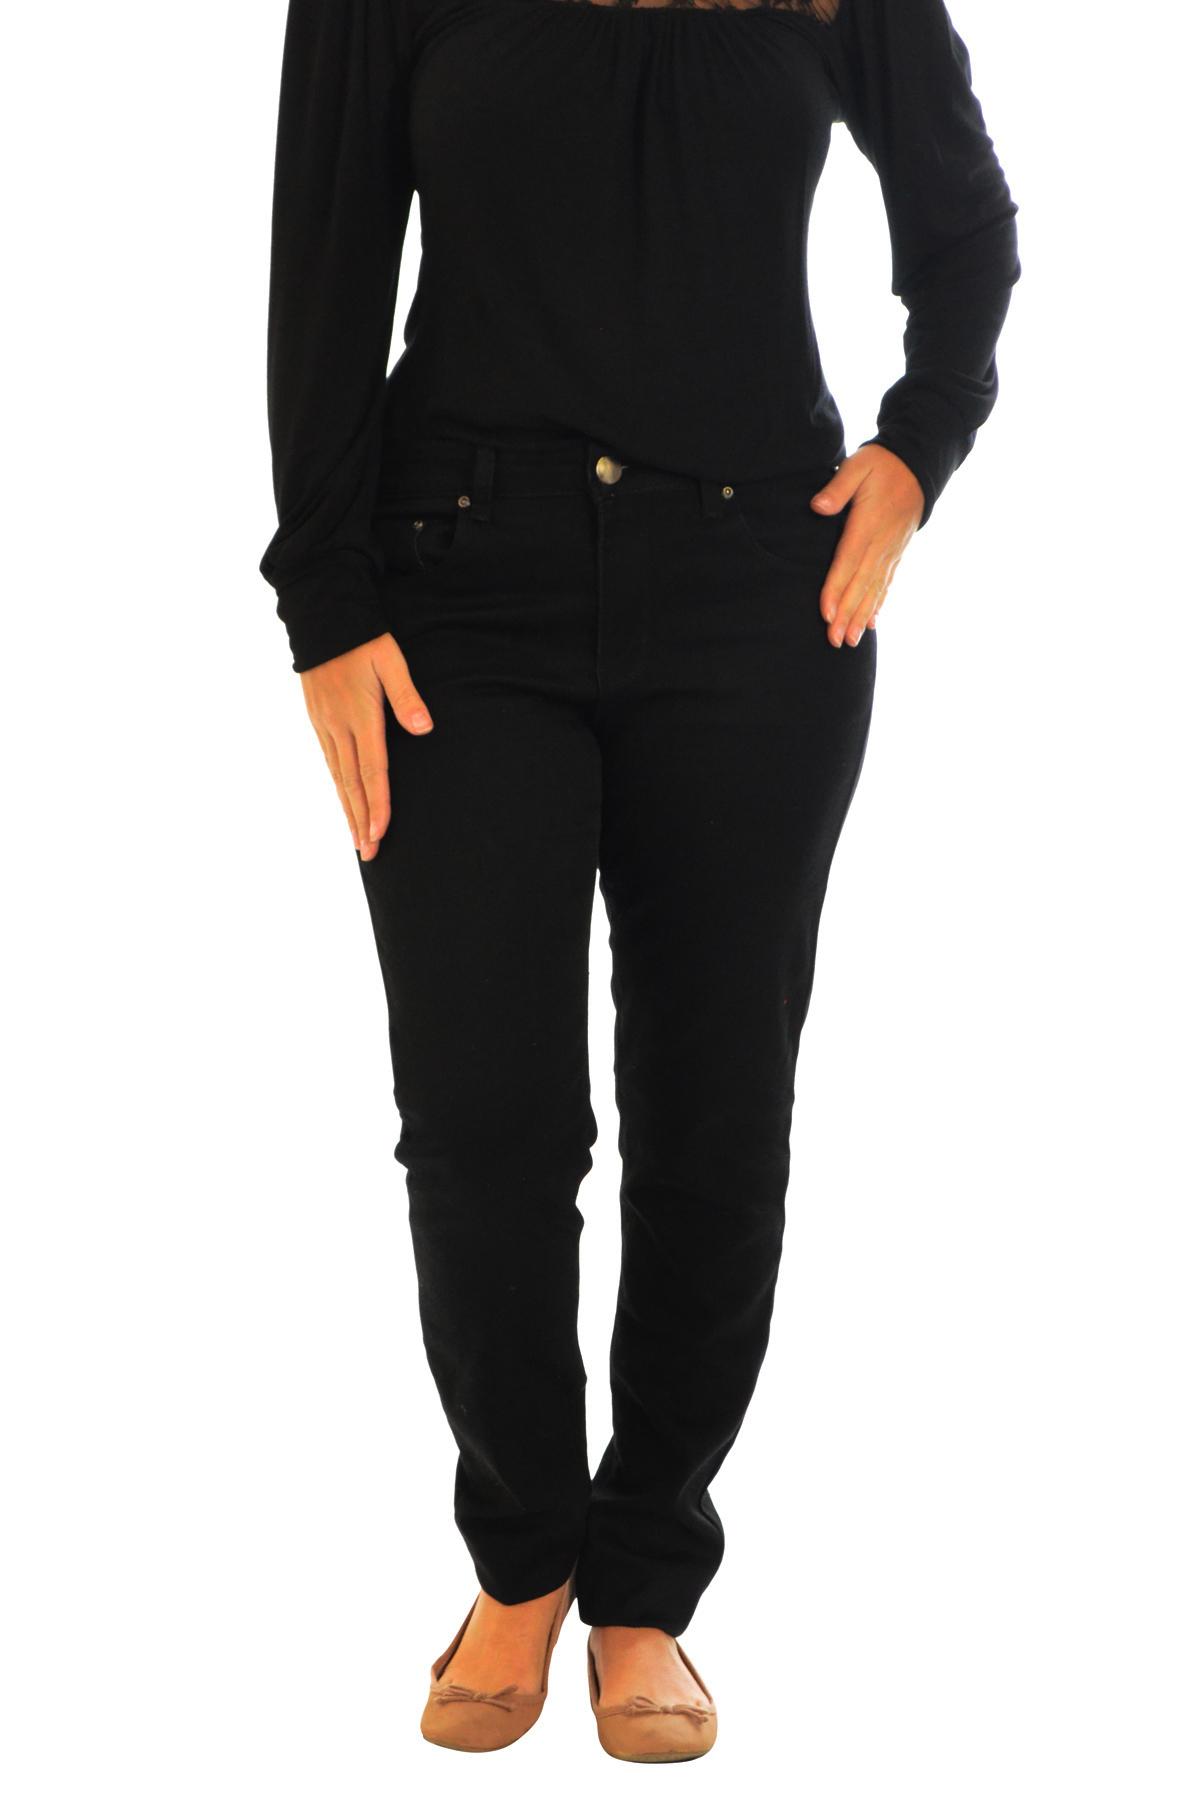 New Ladies Plus Size Jeans Womens Black Trousers Straight Leg Pockets Nouvelle | eBay